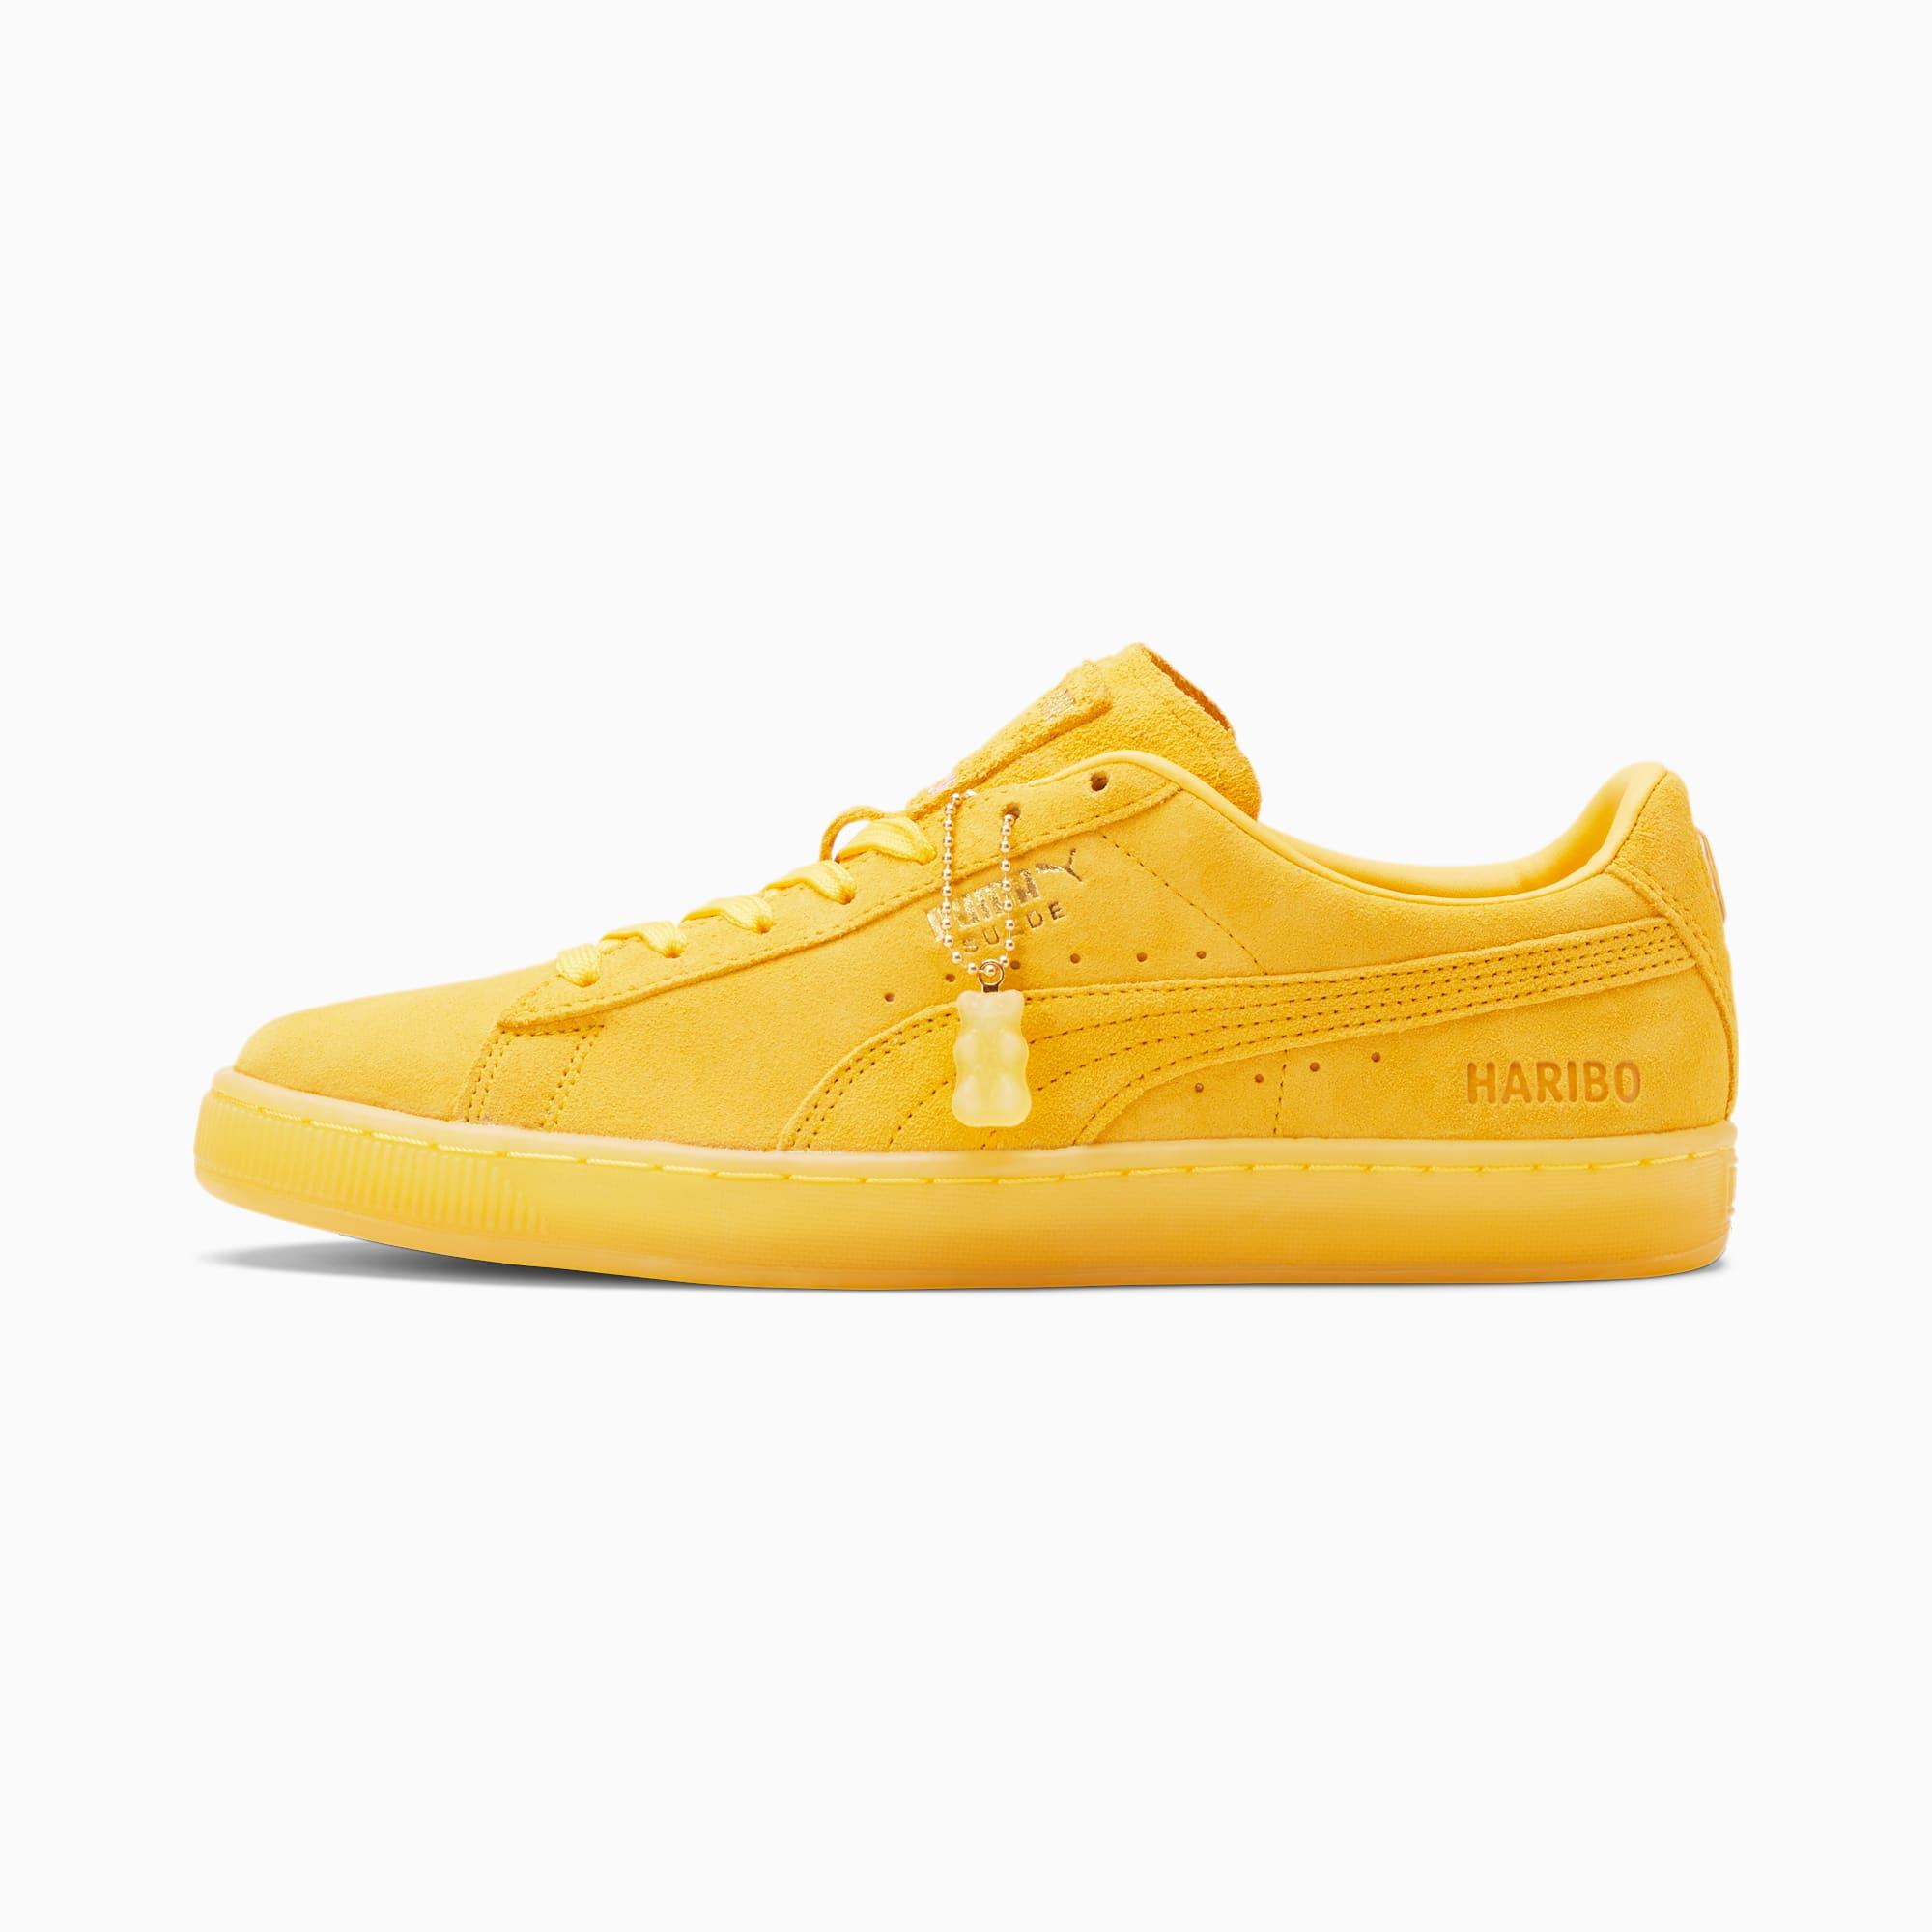 PUMA x HARIBO Men's Suede Sneakers